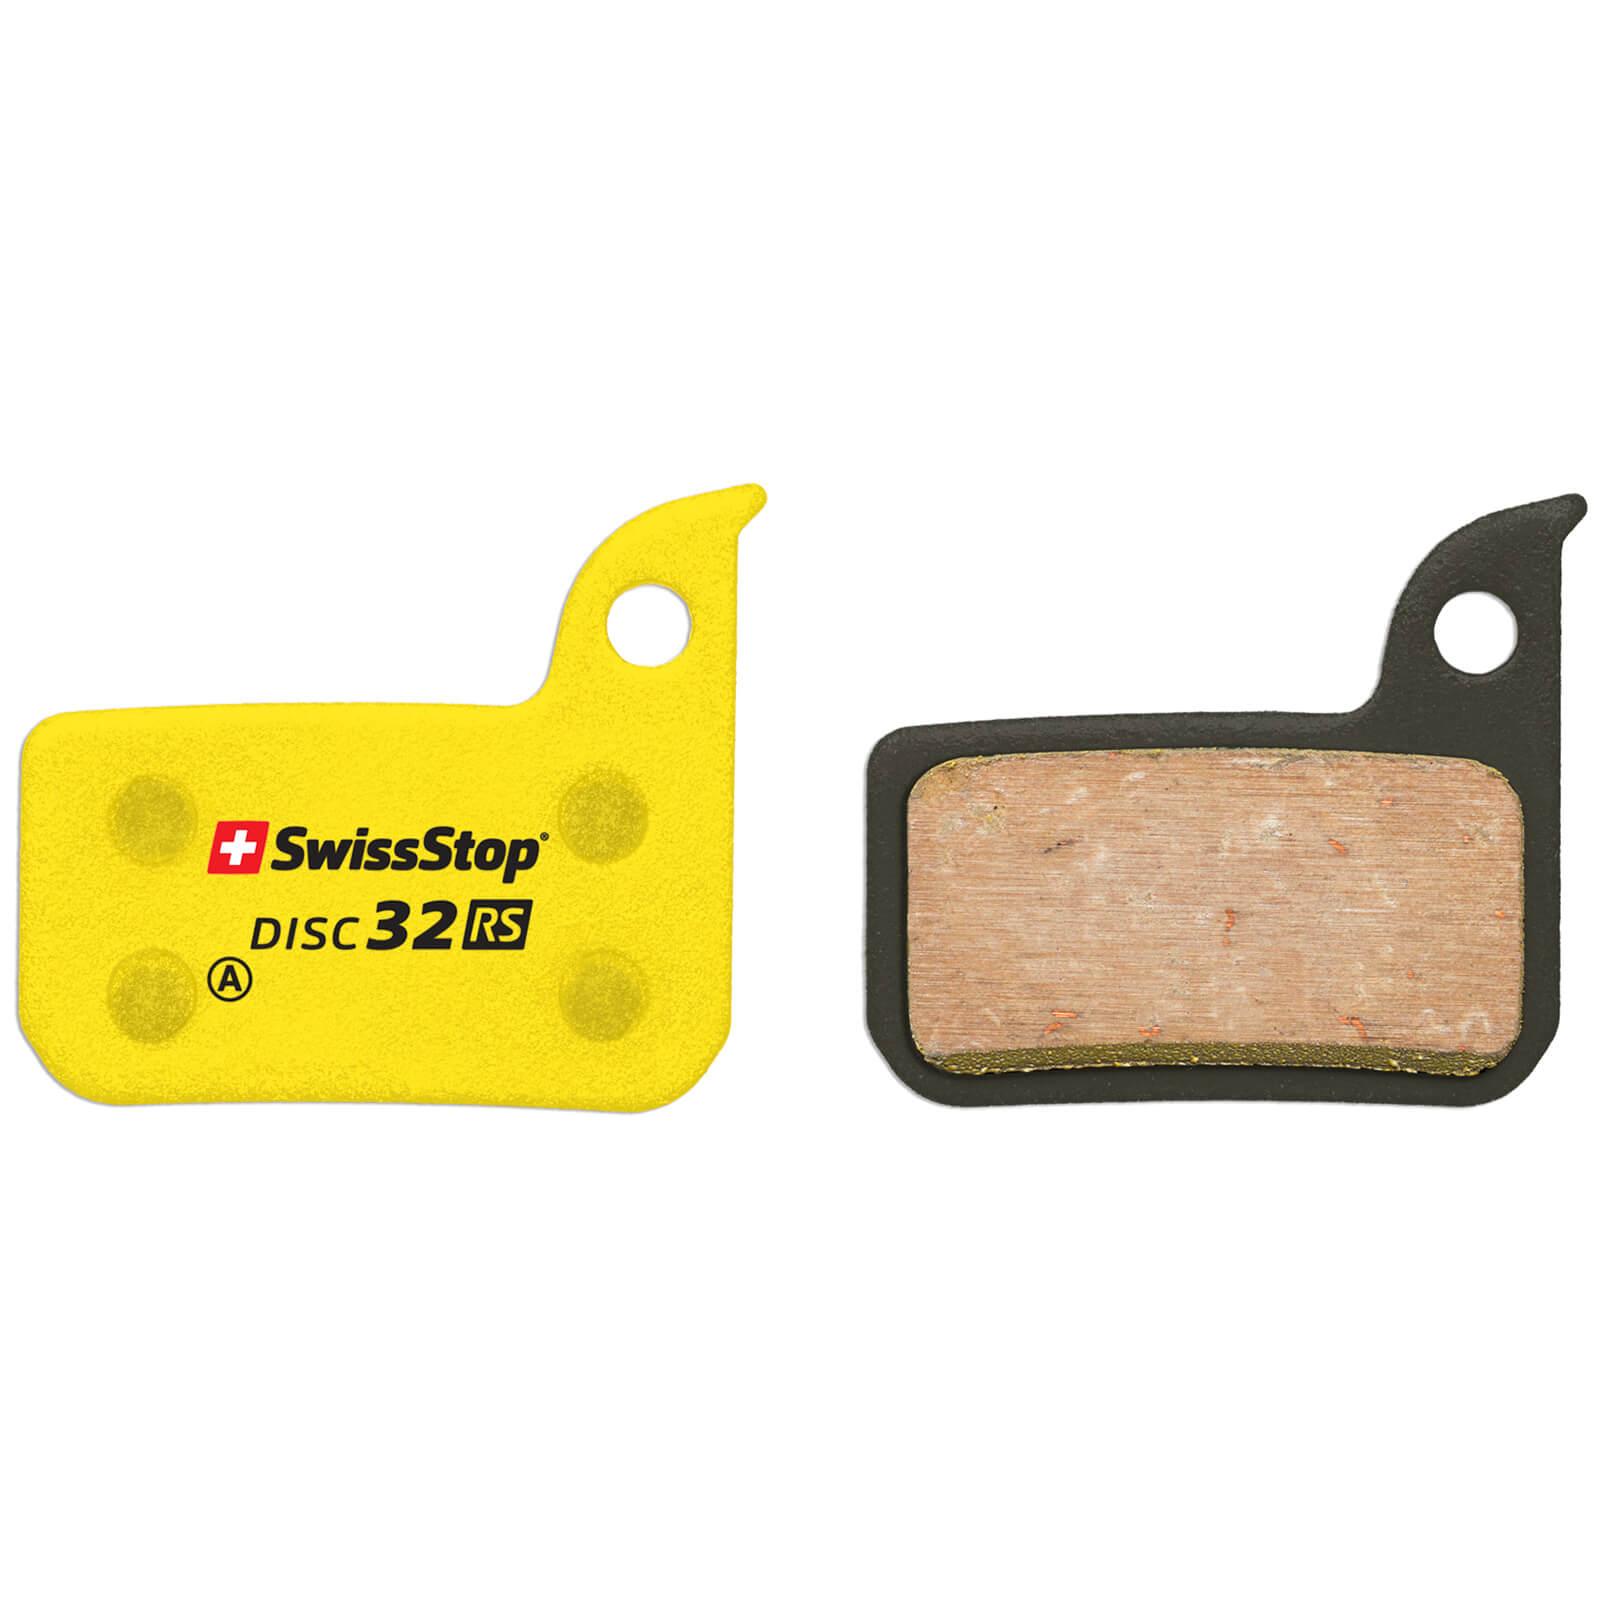 Swissstop Rs Disc Brake Pads - Disc 32